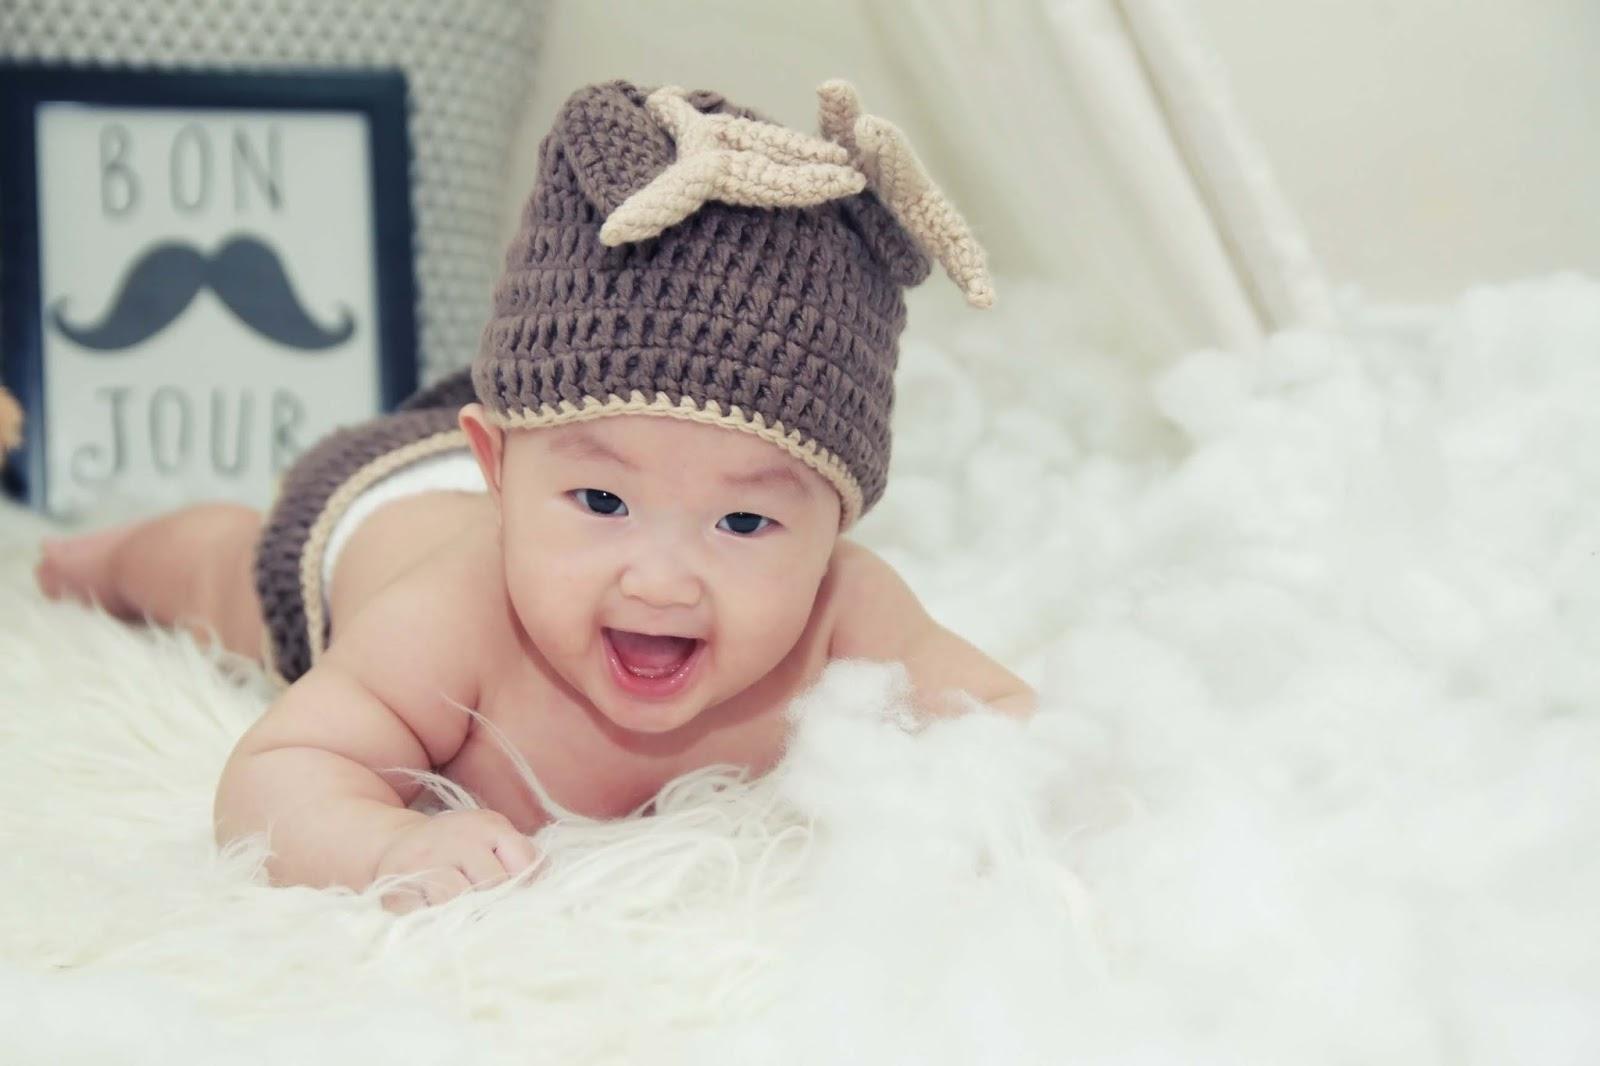 smiling baby wallpaper